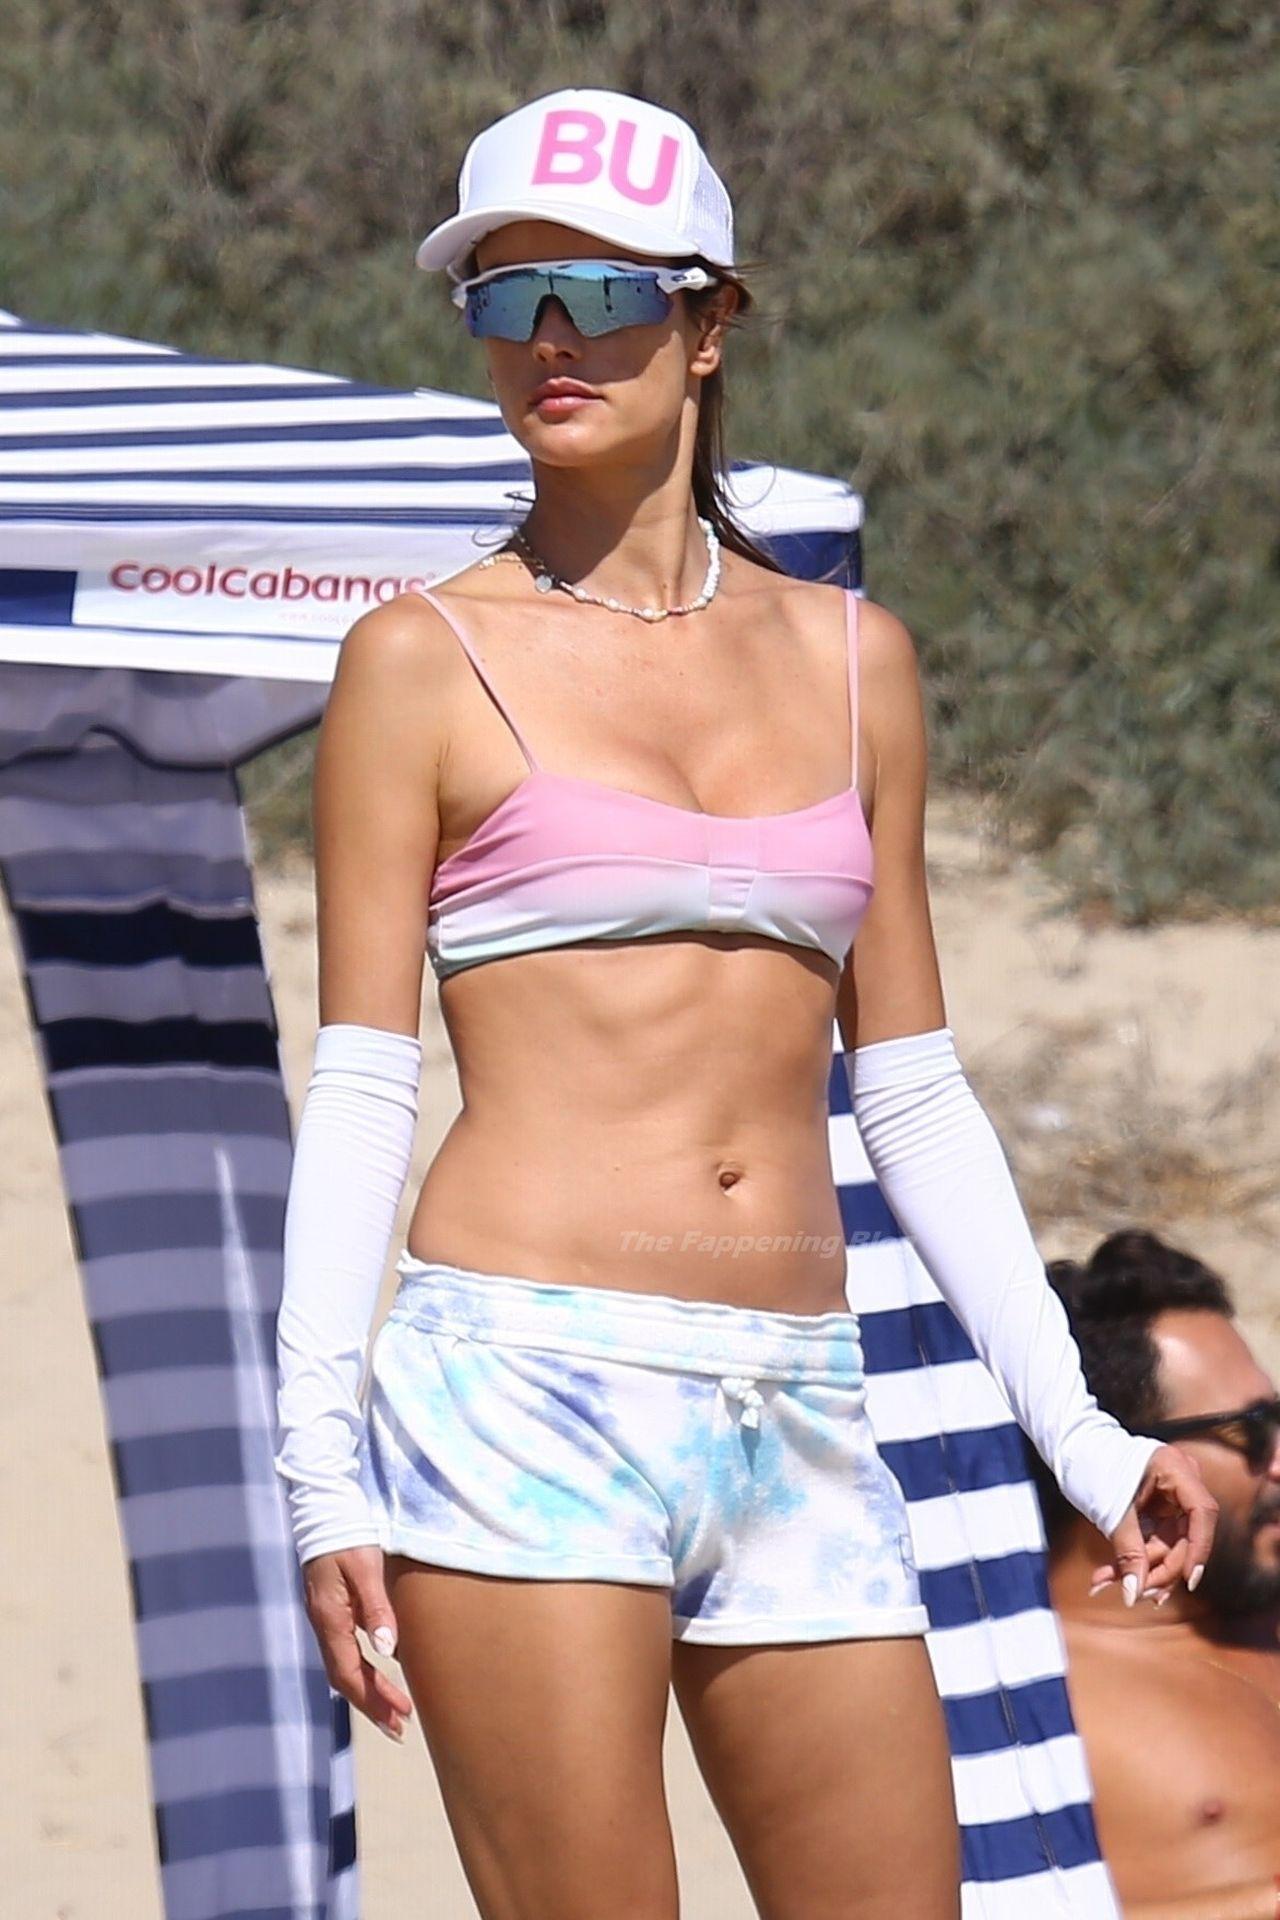 Alessandra-Ambrosio-Sexy-The-Fappening-Blog-4-2.jpg